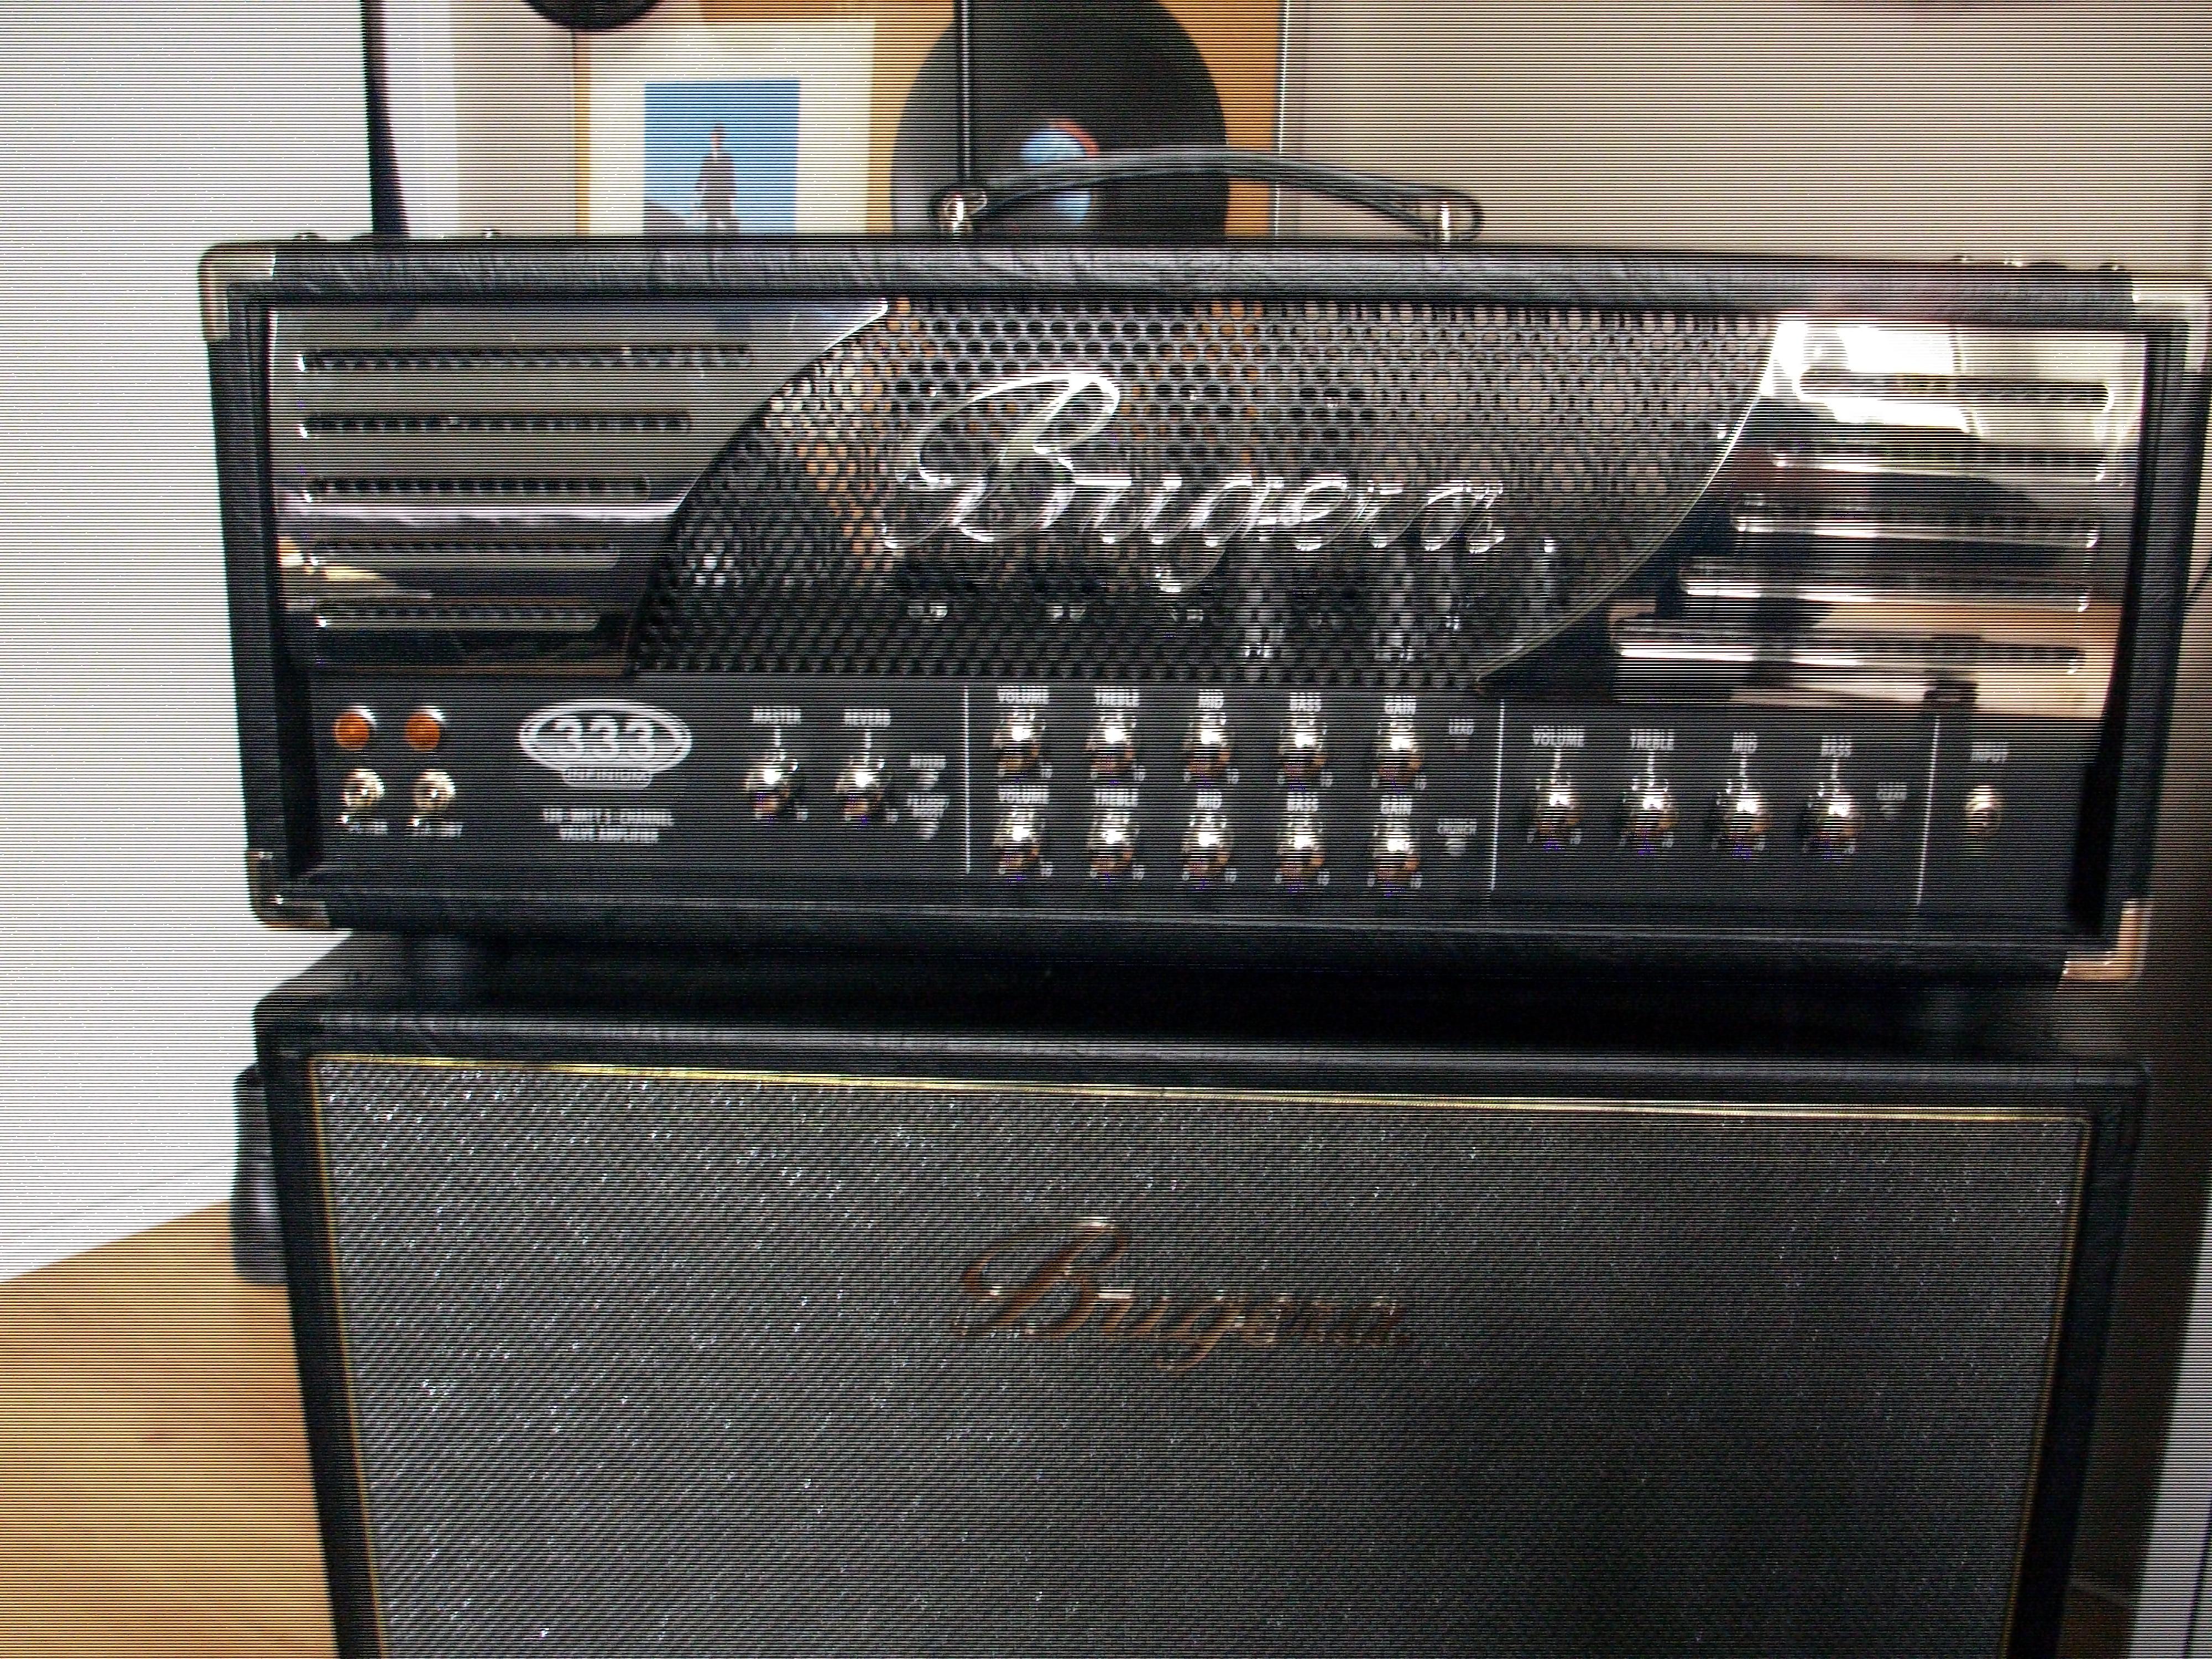 333 infinium tête dampli guitare tout lampe de la marque bugera